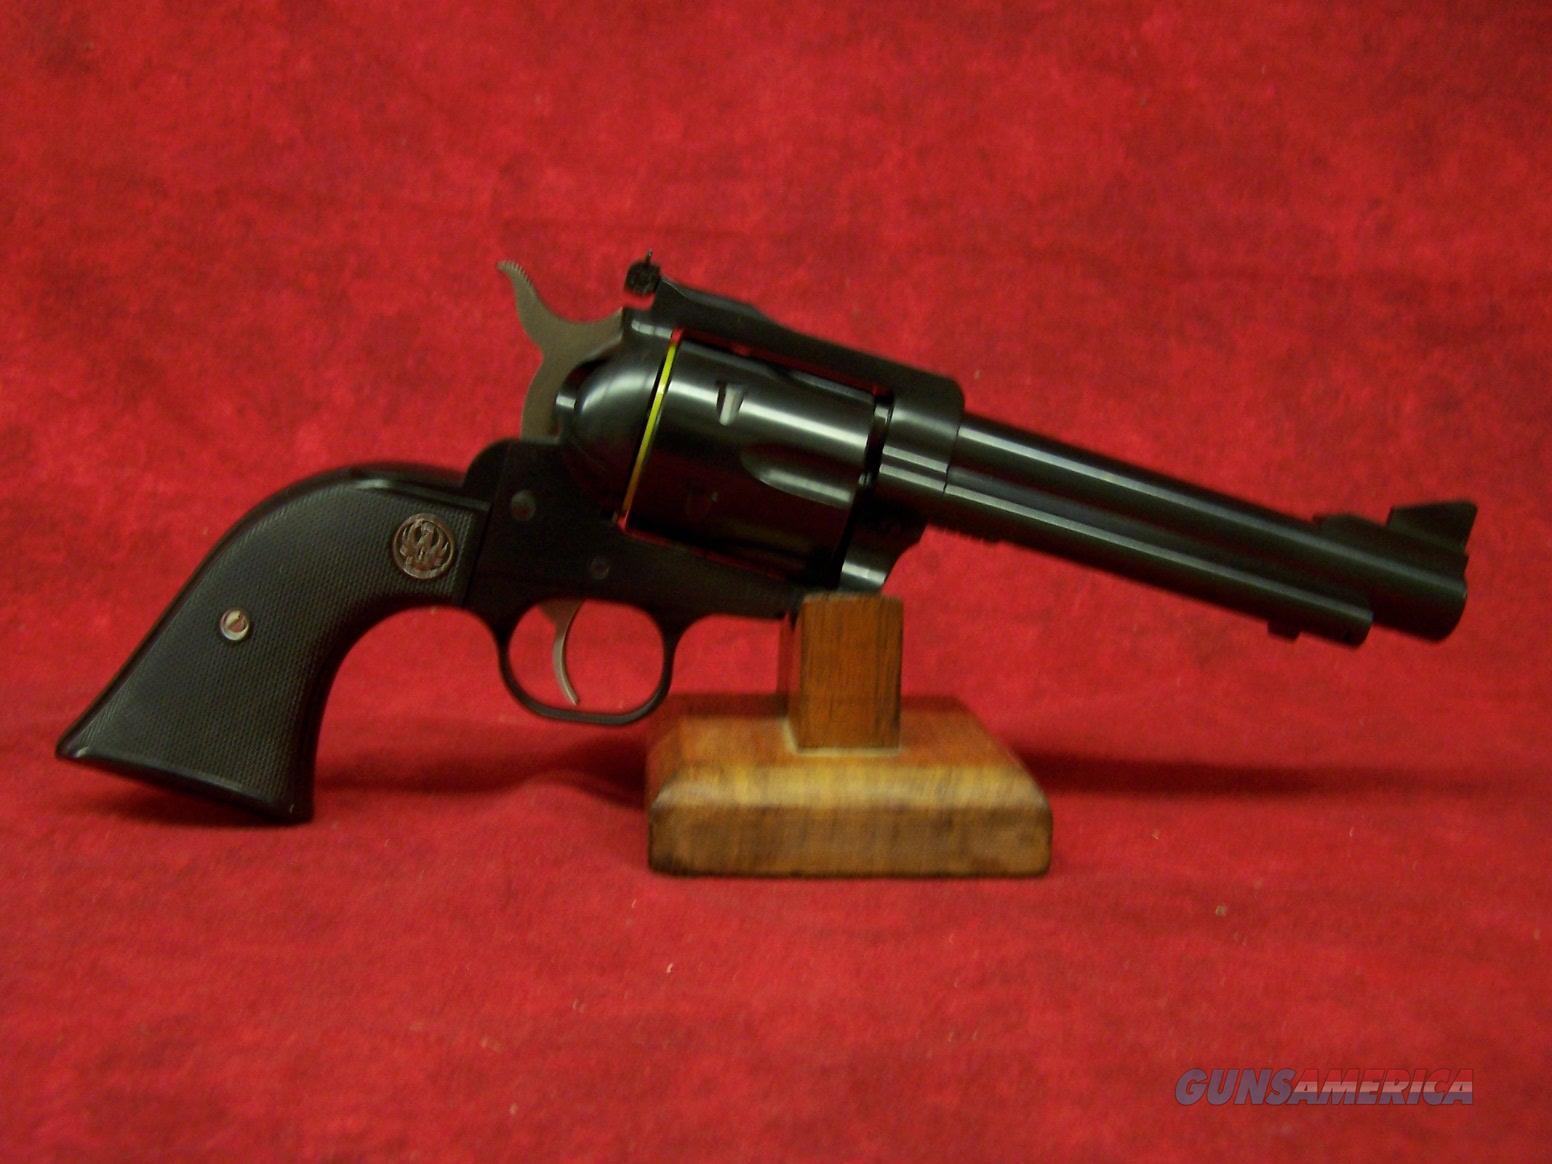 Ruger Blackhawk Convertible .45 Long Colt/.45 Auto 5.5 Inch Barrel Blue Finish (0463)  Guns > Pistols > Ruger Single Action Revolvers > Blackhawk Type